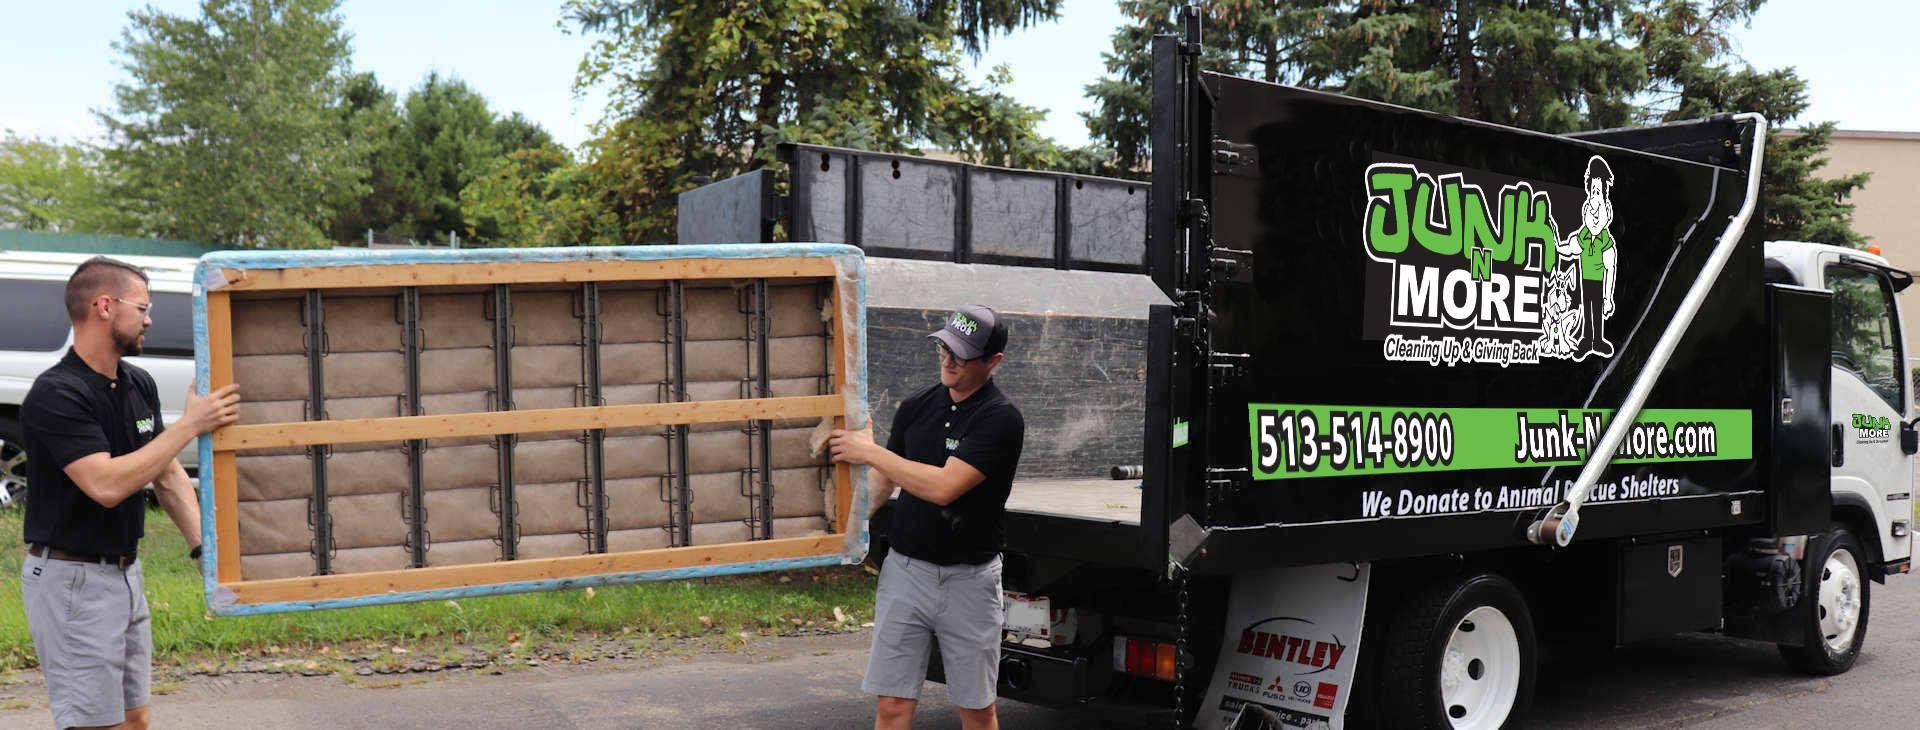 Loading Mattress on Truck